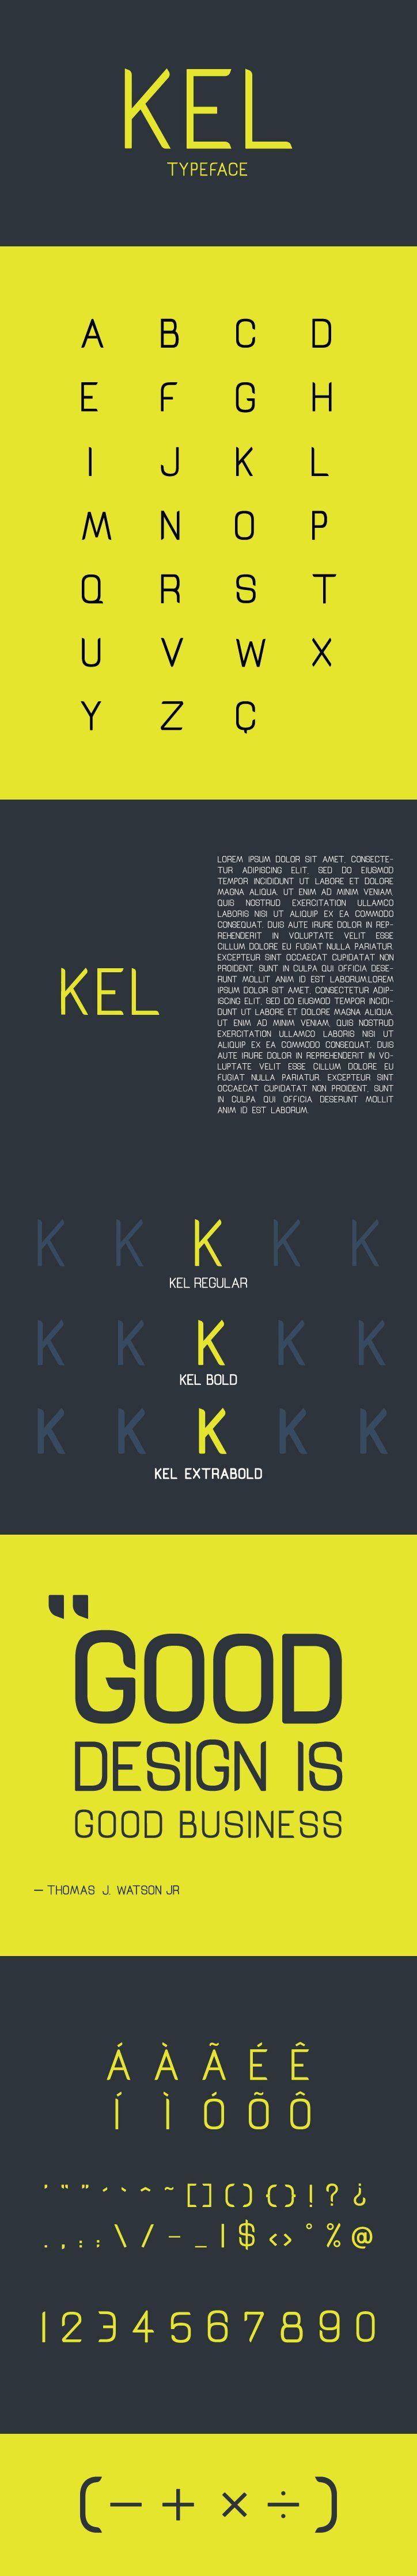 Best Free Fonts For Web Design # 75